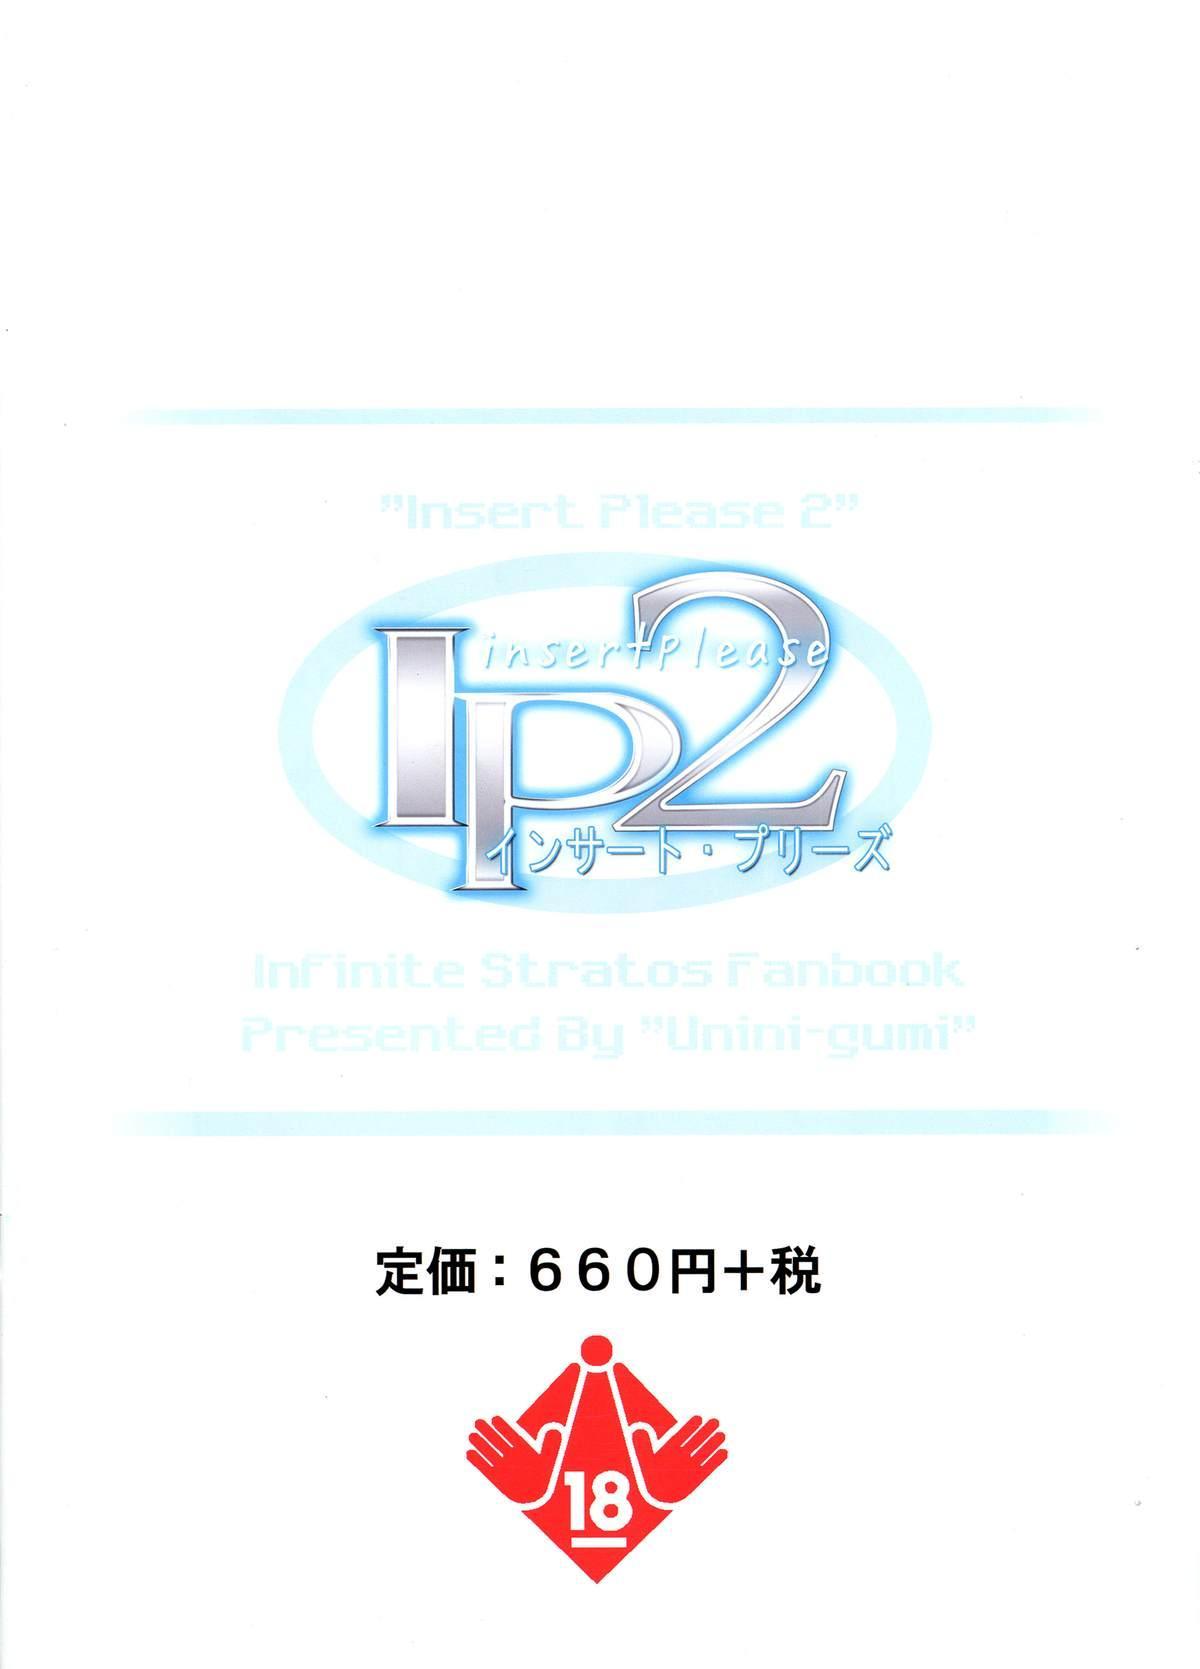 IP2 1